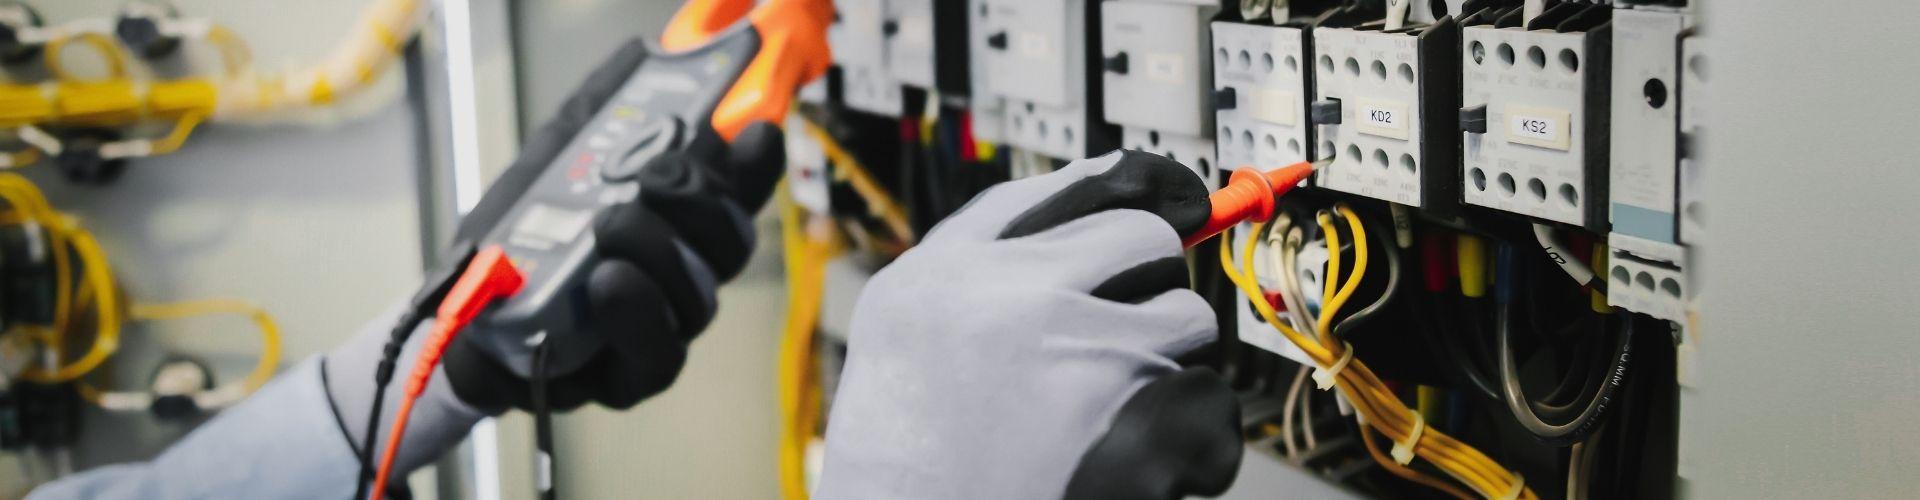 Electrical Enclosure Safety gudie